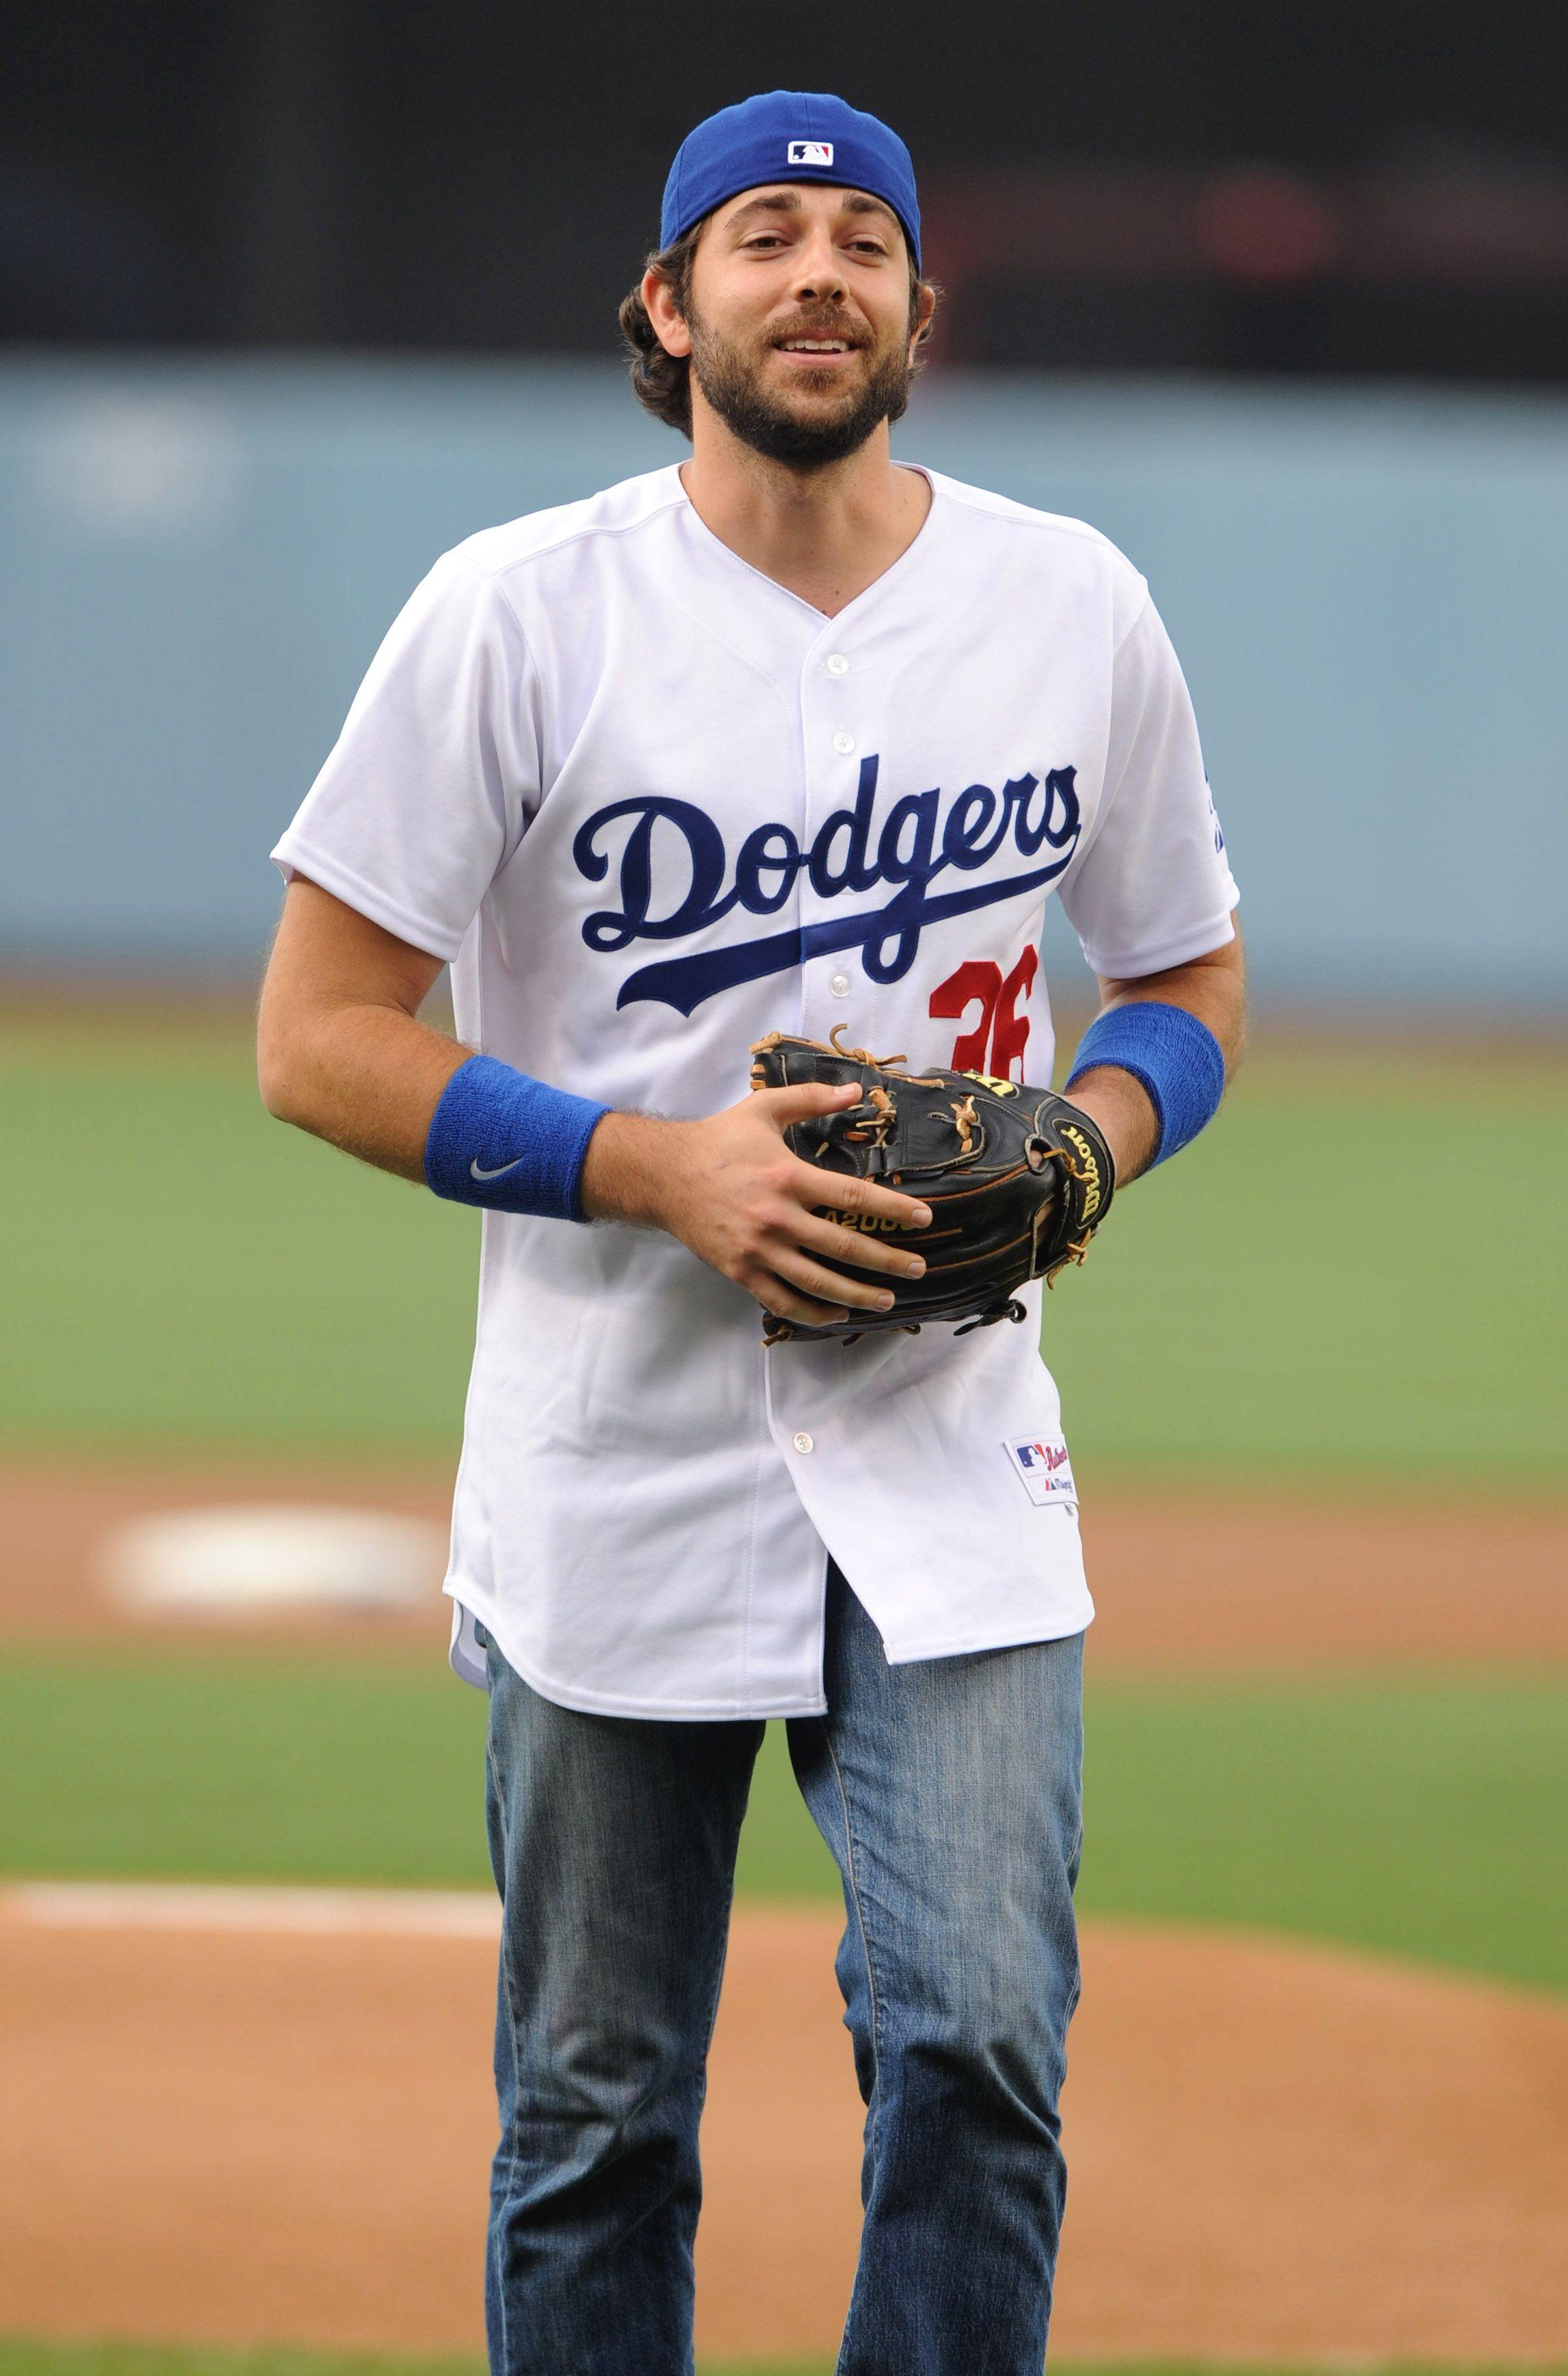 Zachary Levi On A Baseball Field Happiness Zachary Levi Imaginary Boyfriend Levi